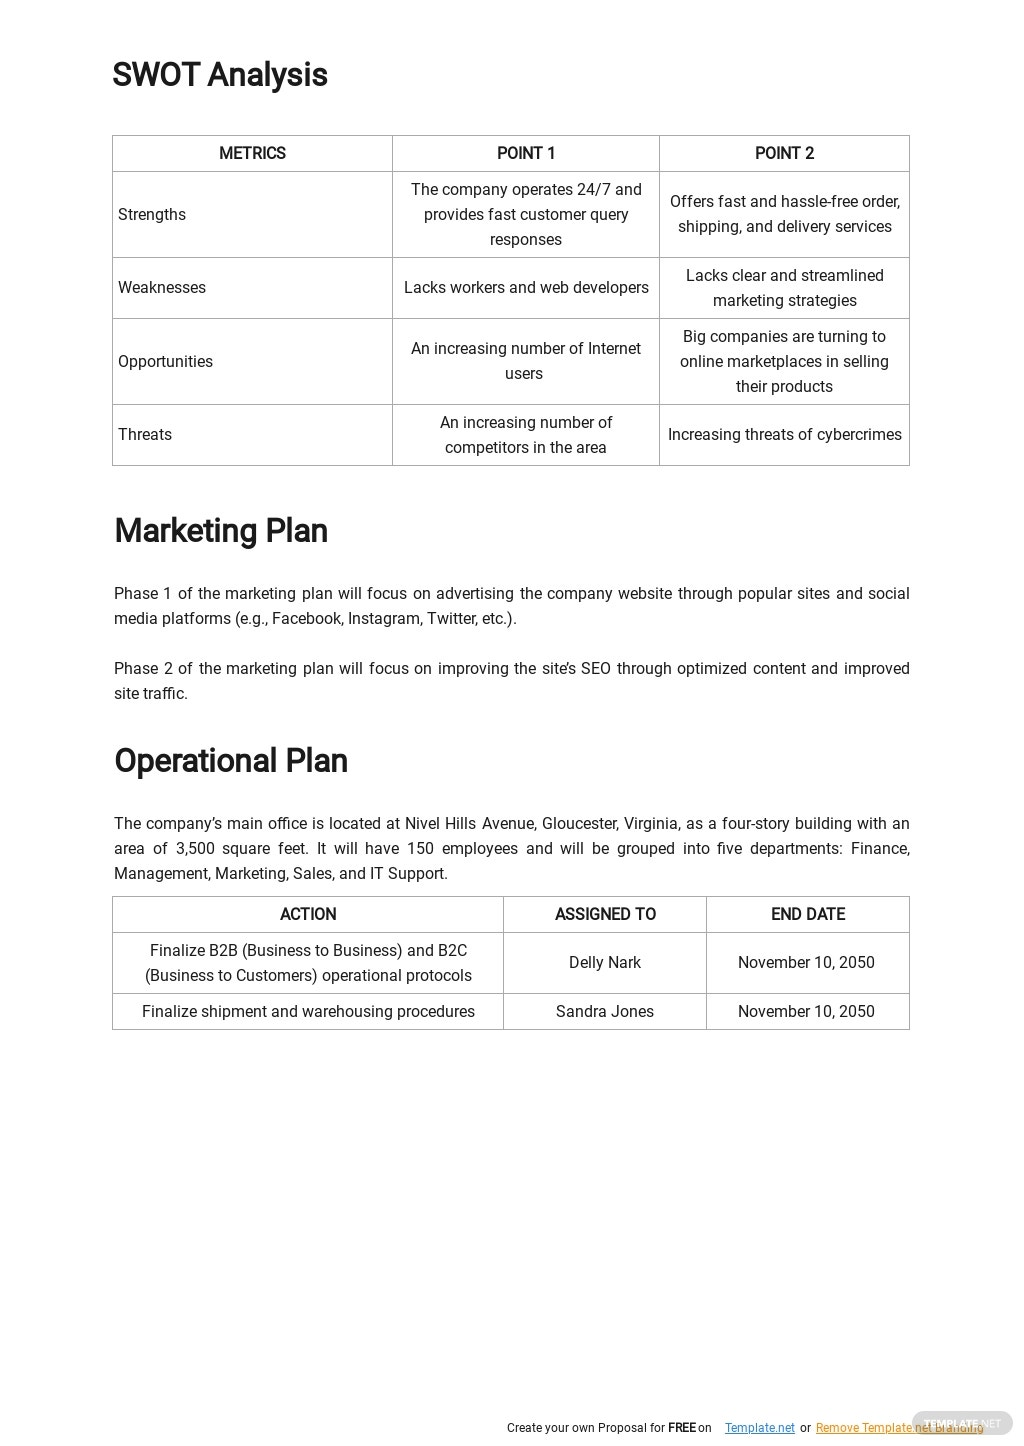 Online Marketplace Business Plan Template 2.jpe